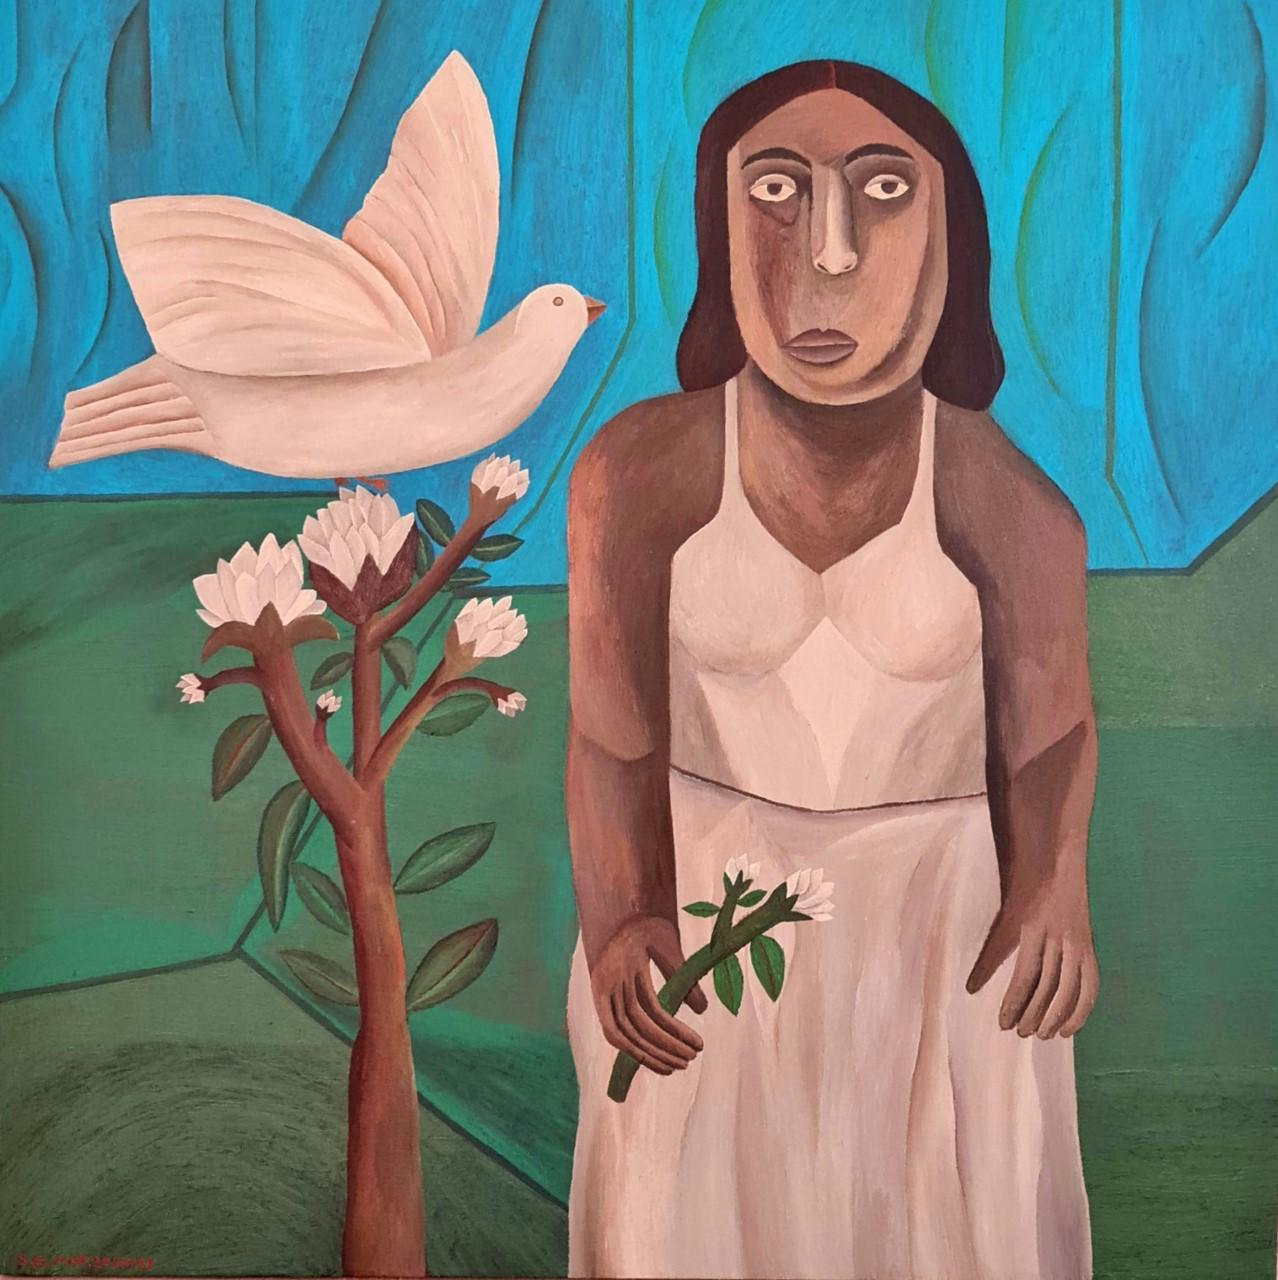 thumbnail_2. Salah Elmur, The White Dove, 2021, Courtesy of Circle Art Gallery..jpg